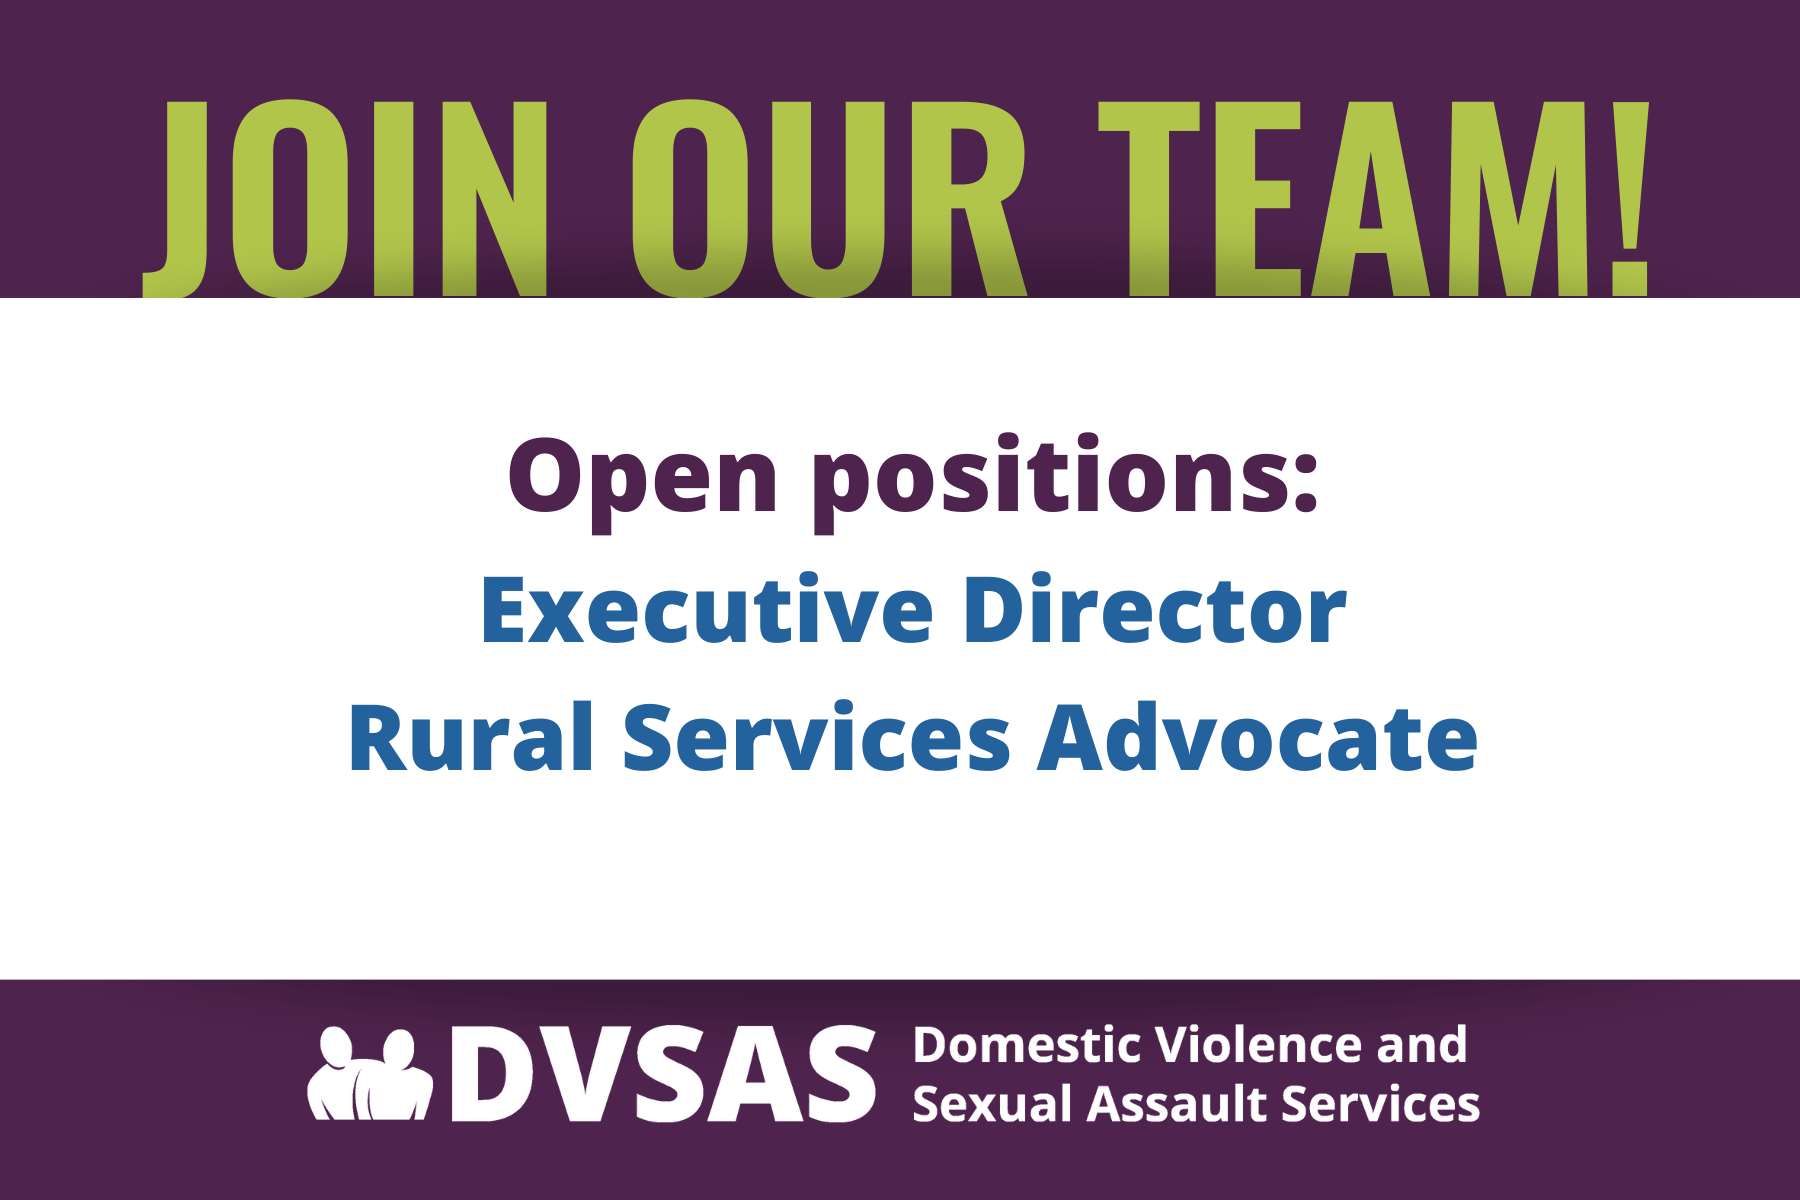 https://www.dvsas.org/get-involved/employment-opportunities/